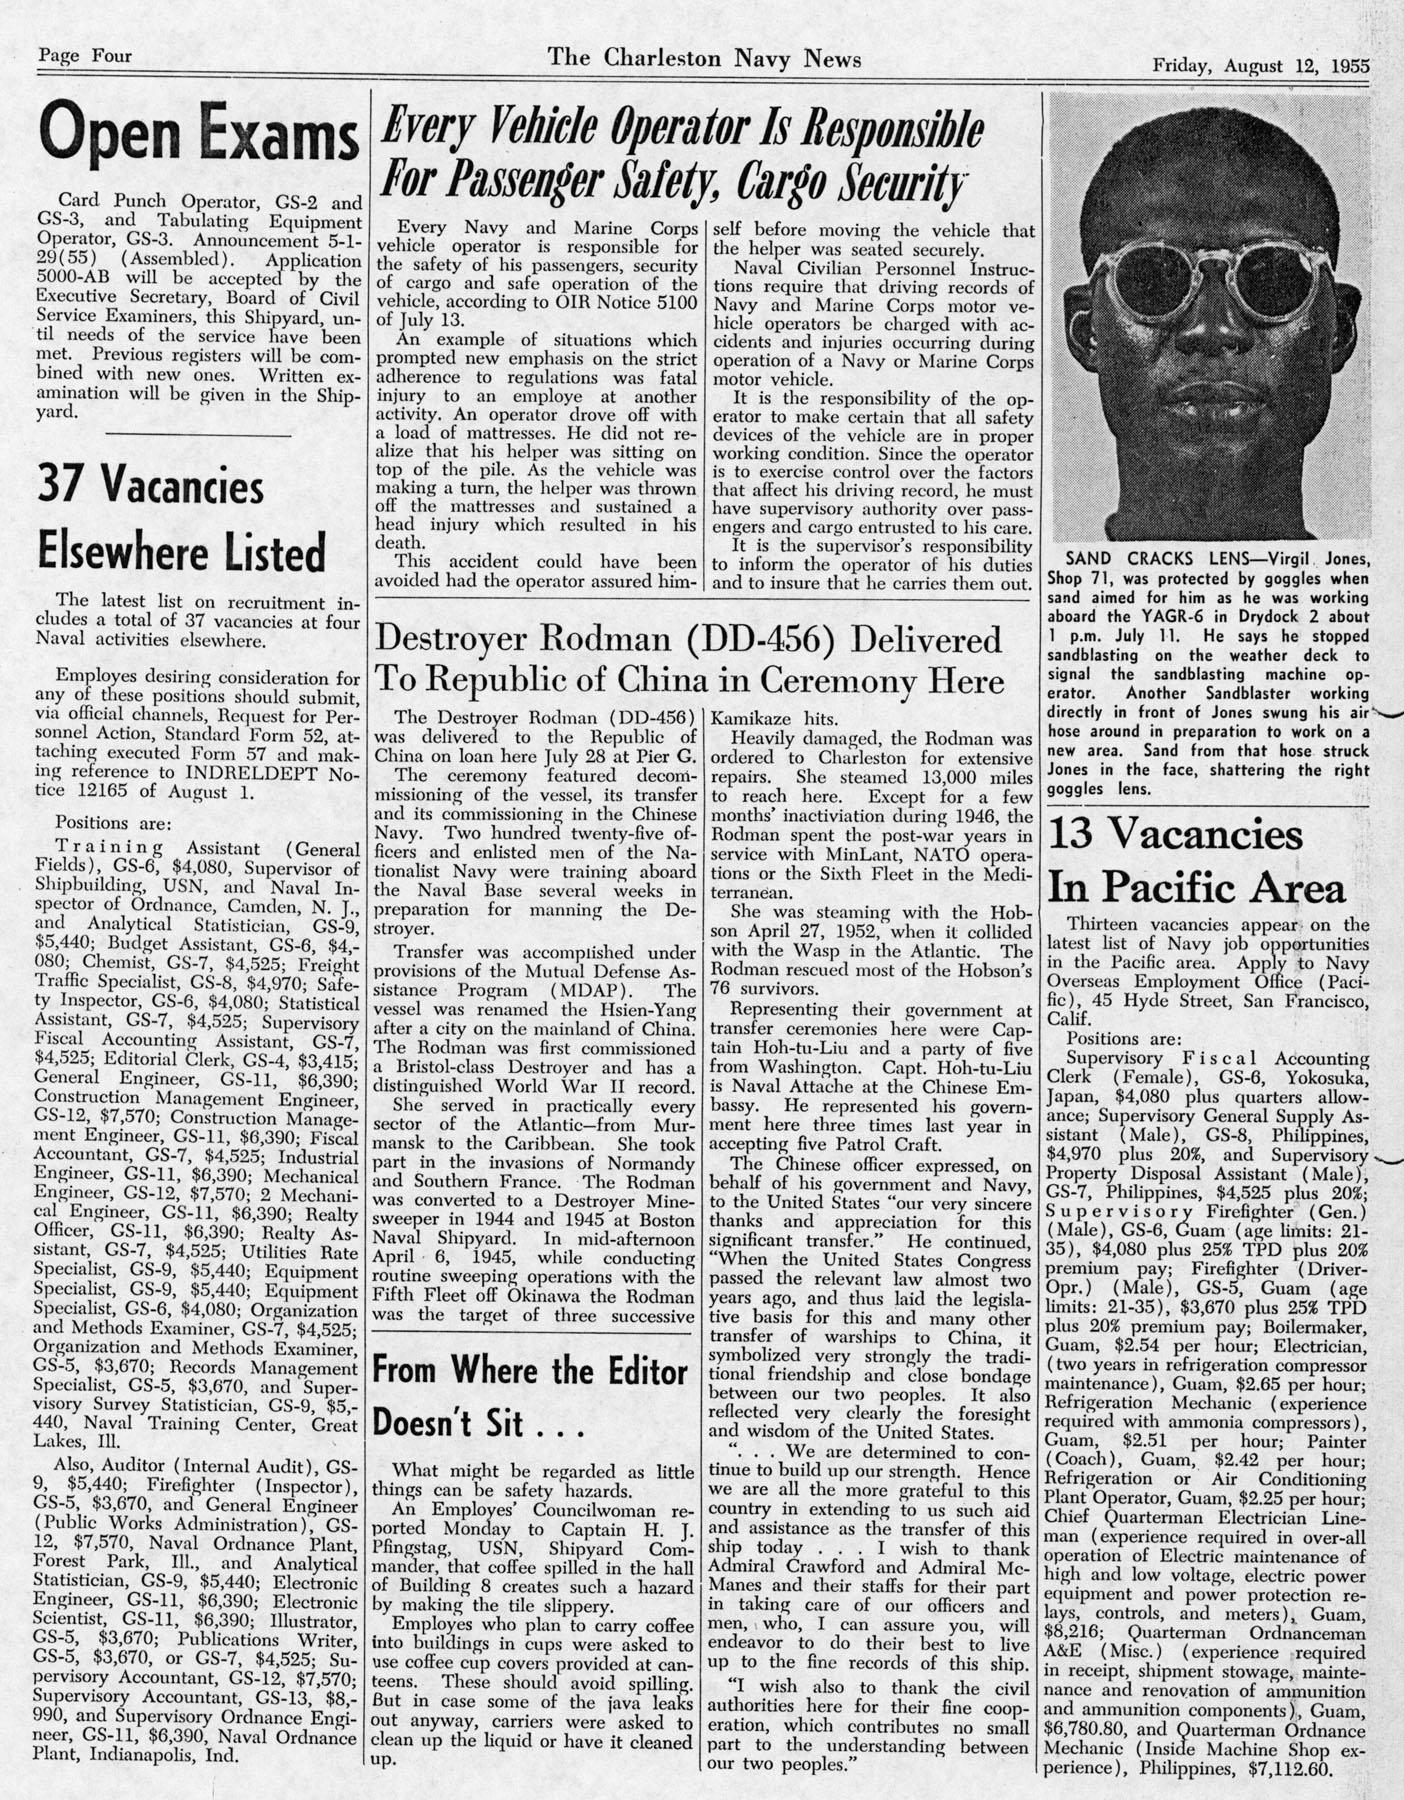 The Charleston Navy News, Volume 14, Edition 2, page iv